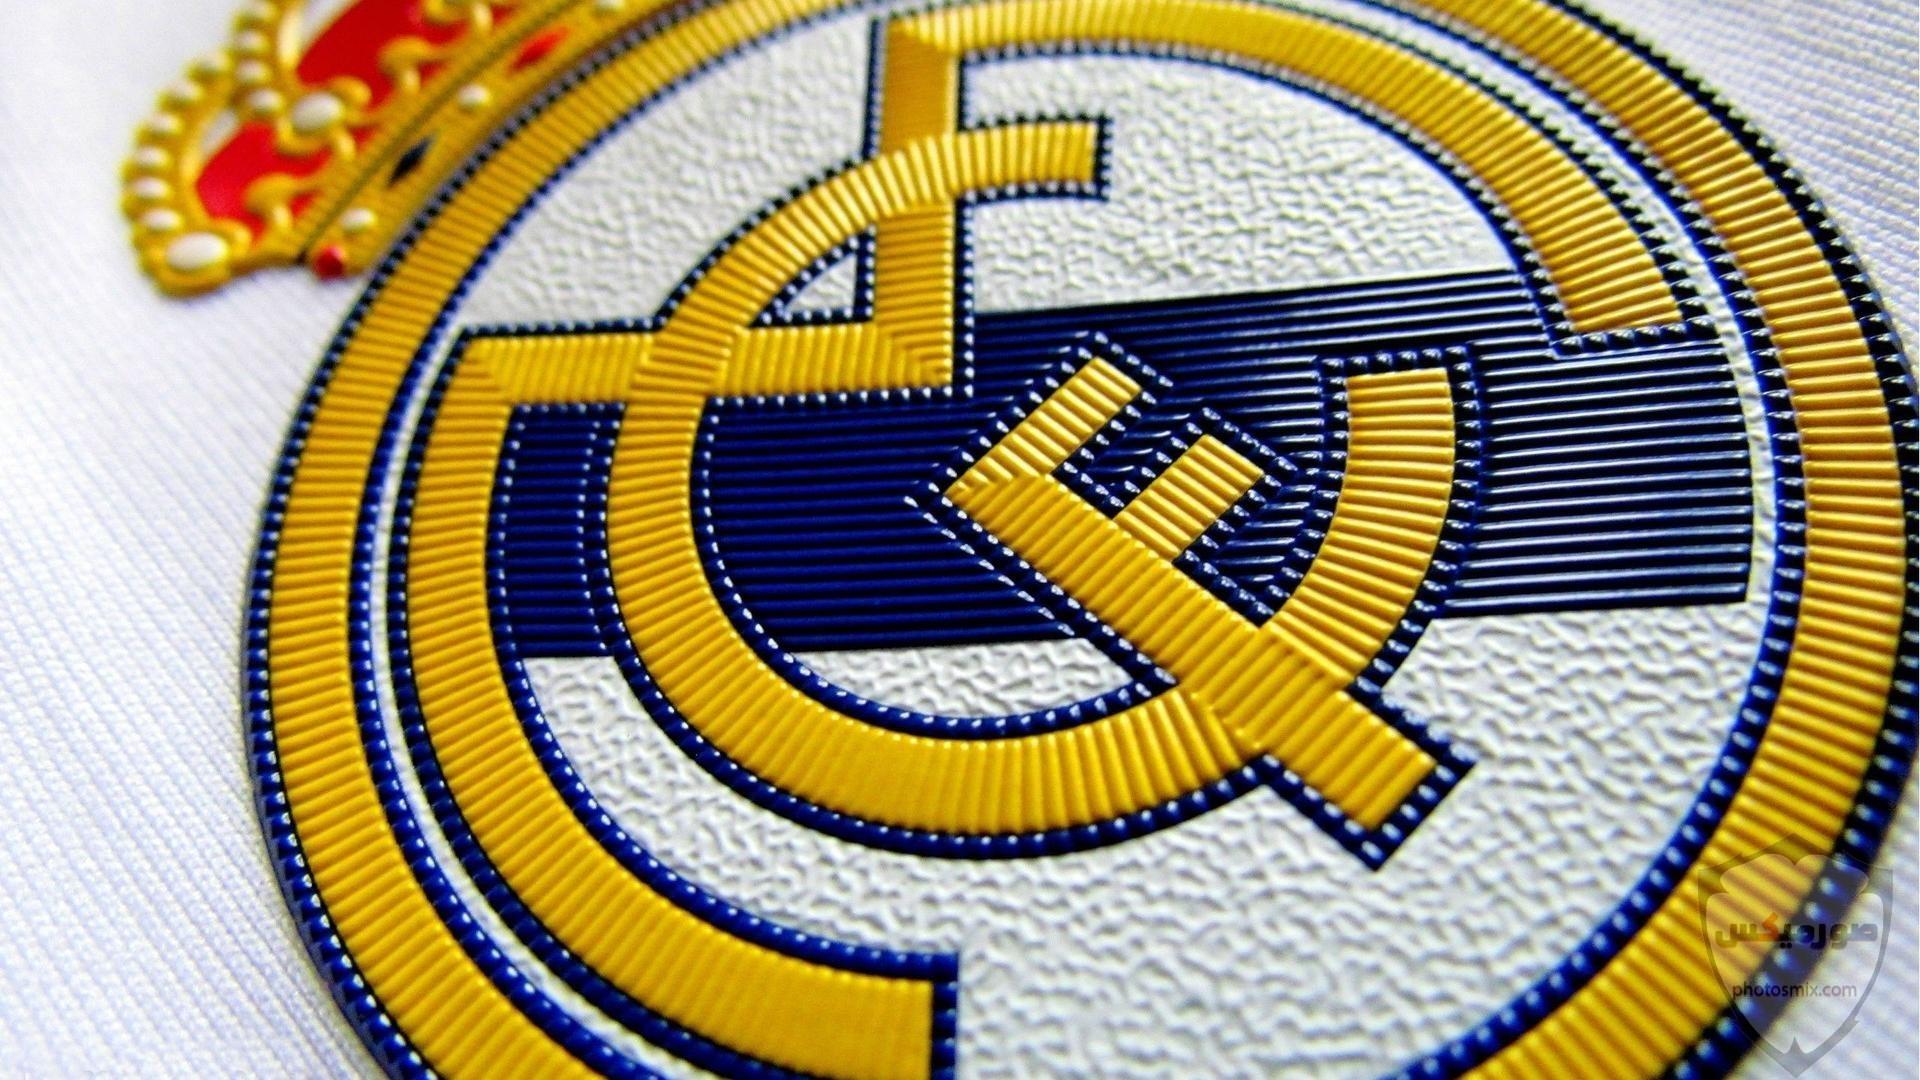 صور ريال مدريد 2020خلفيات ورمزيات ريال مدريد صور لاعبي ريال مدريد real madrid 16